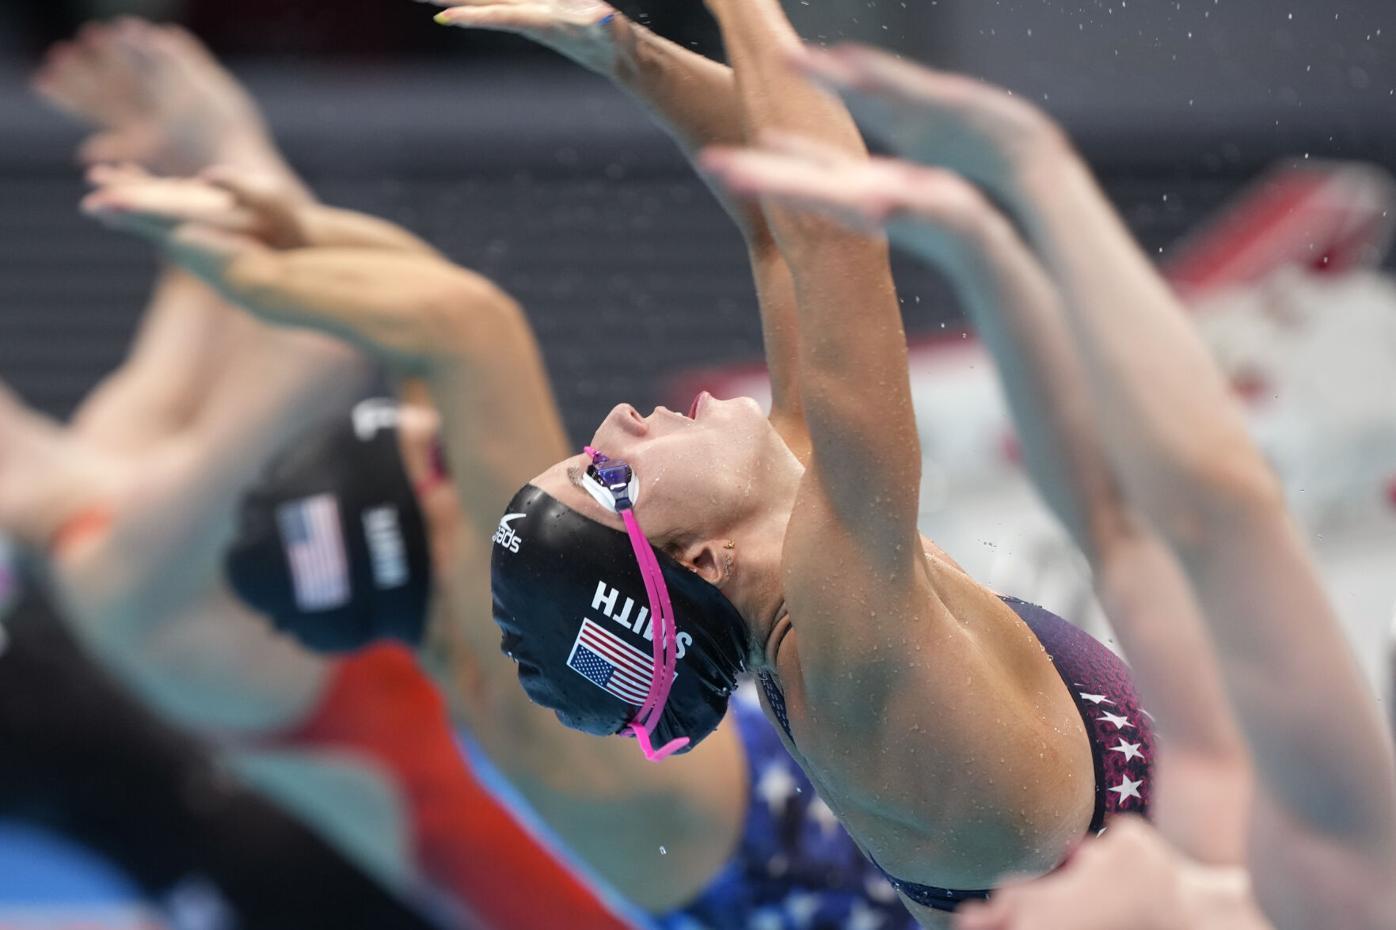 It's bronze for Smith in 100 backstroke